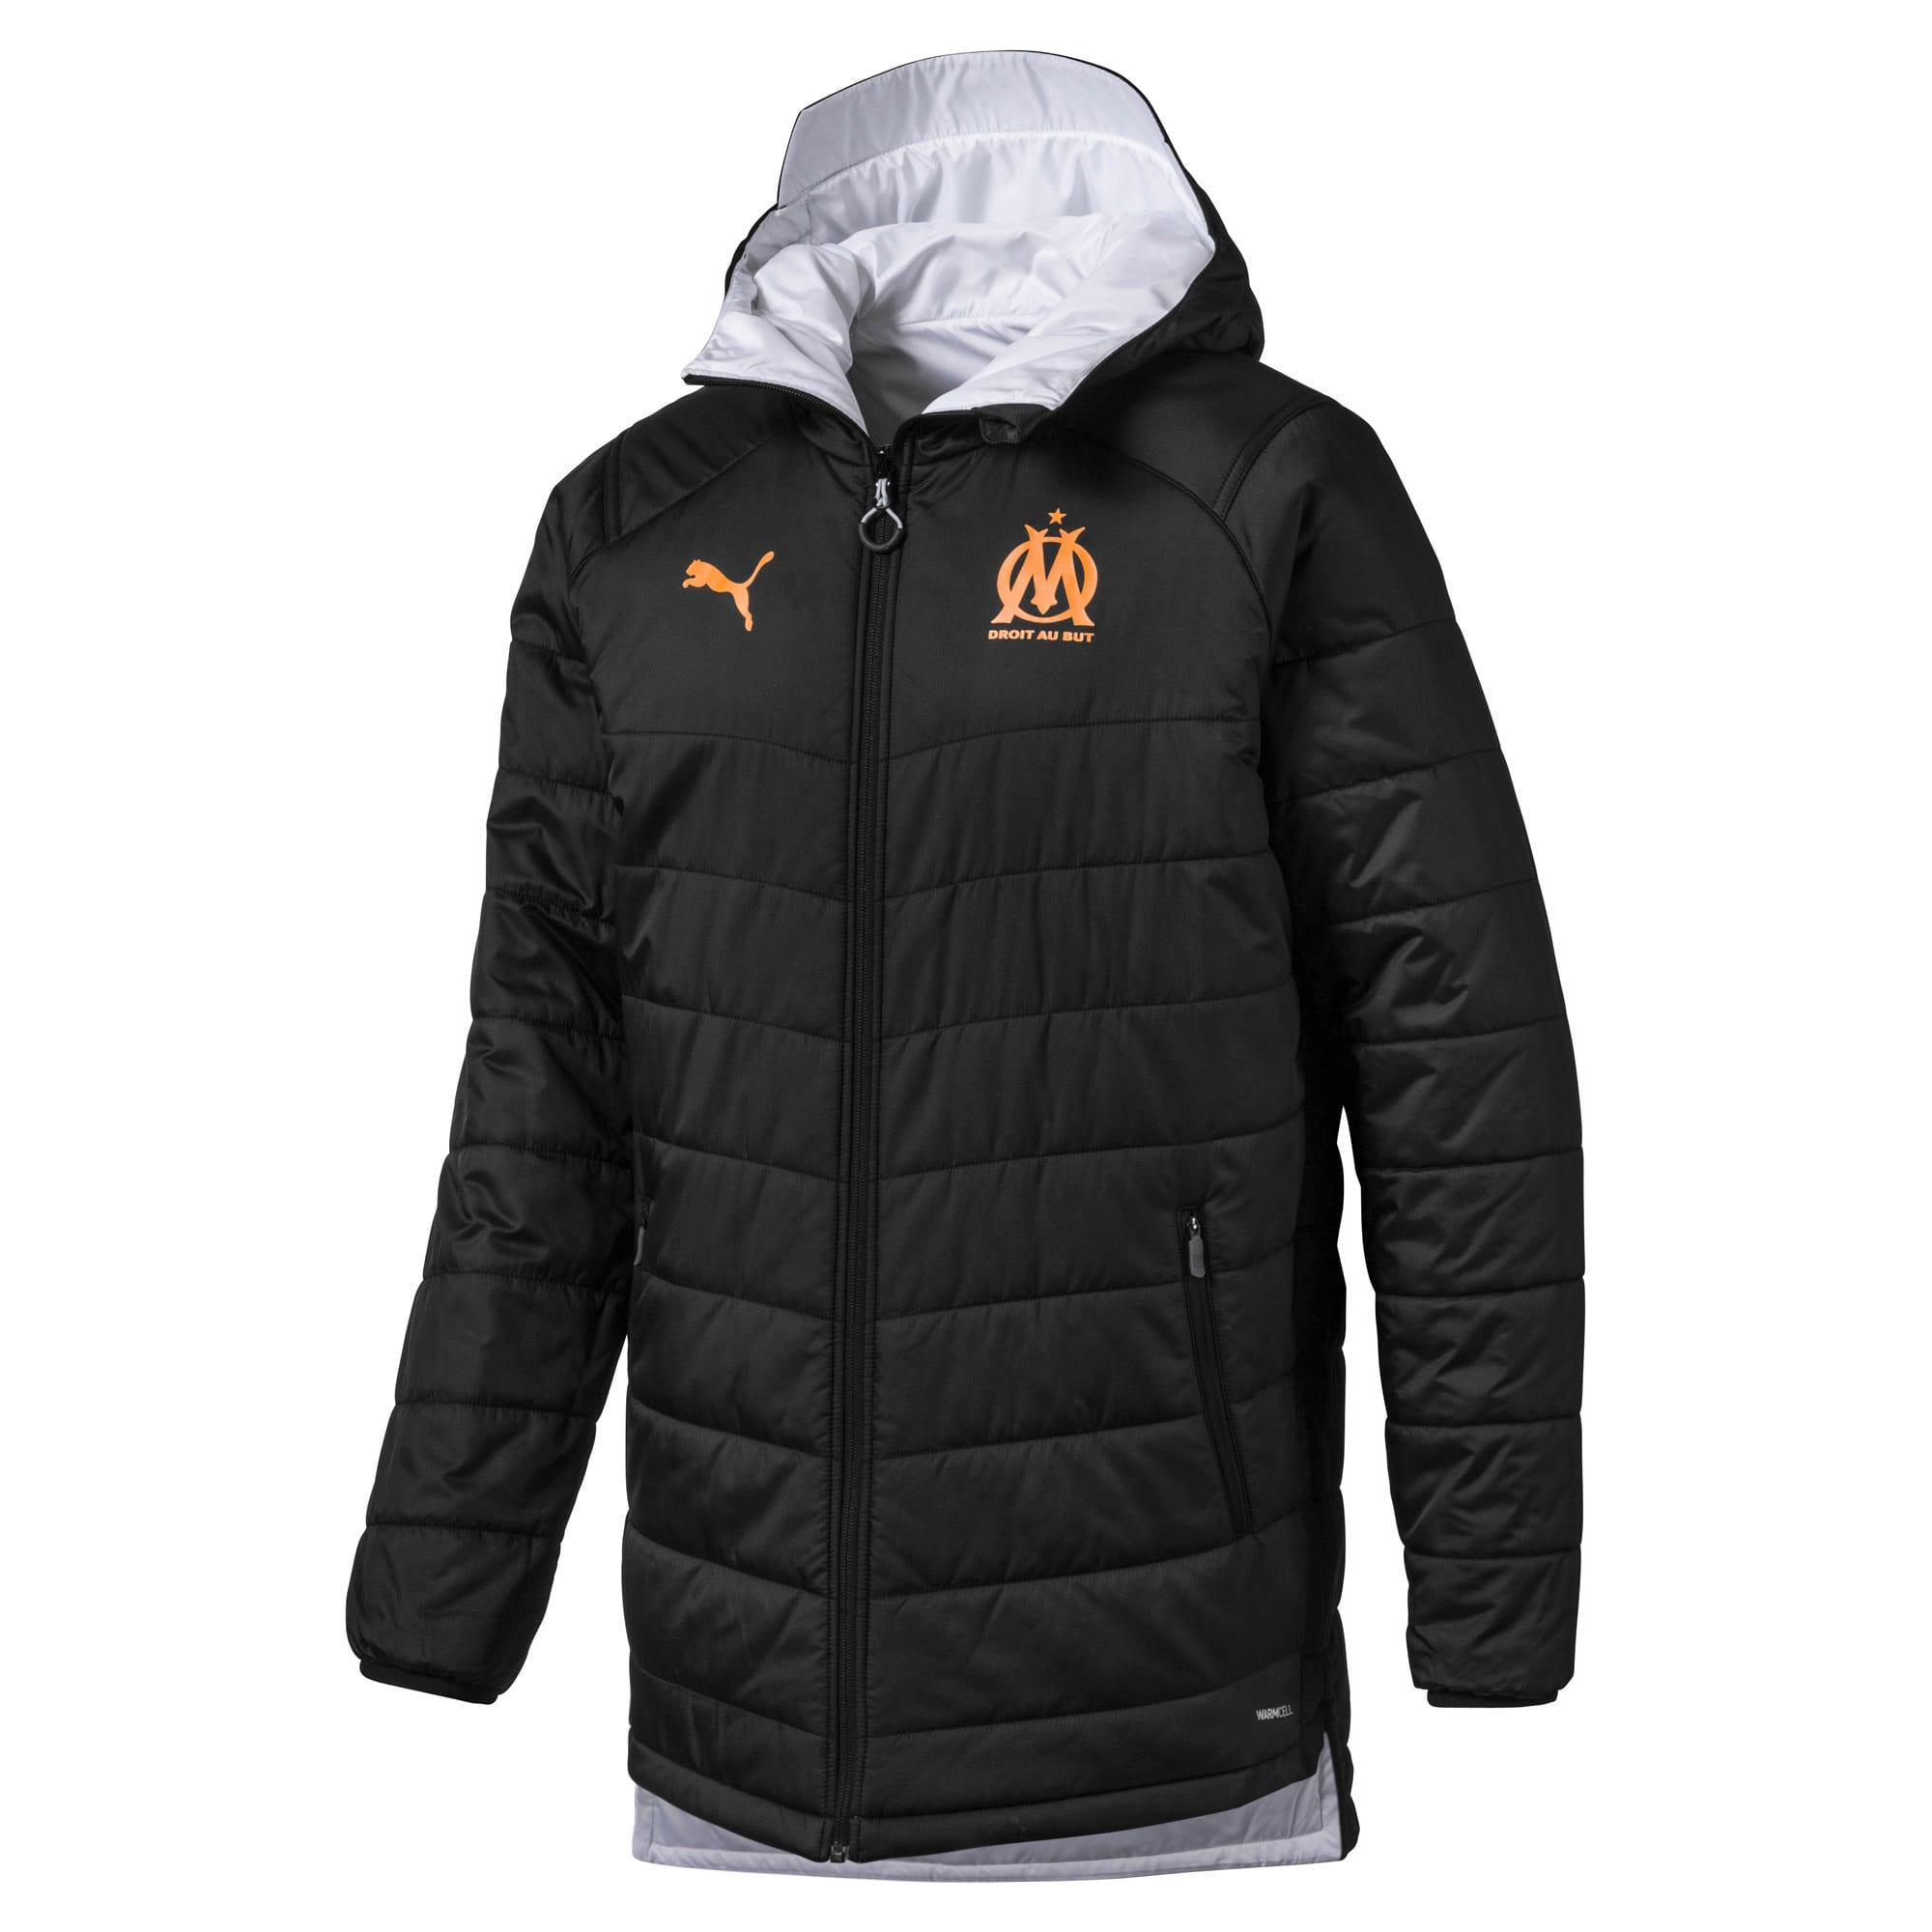 Thumbnail 4 of Olympique de Marseille Bench Men's Replica Reversible Jacket, Puma Black-Orange Popsicle, medium